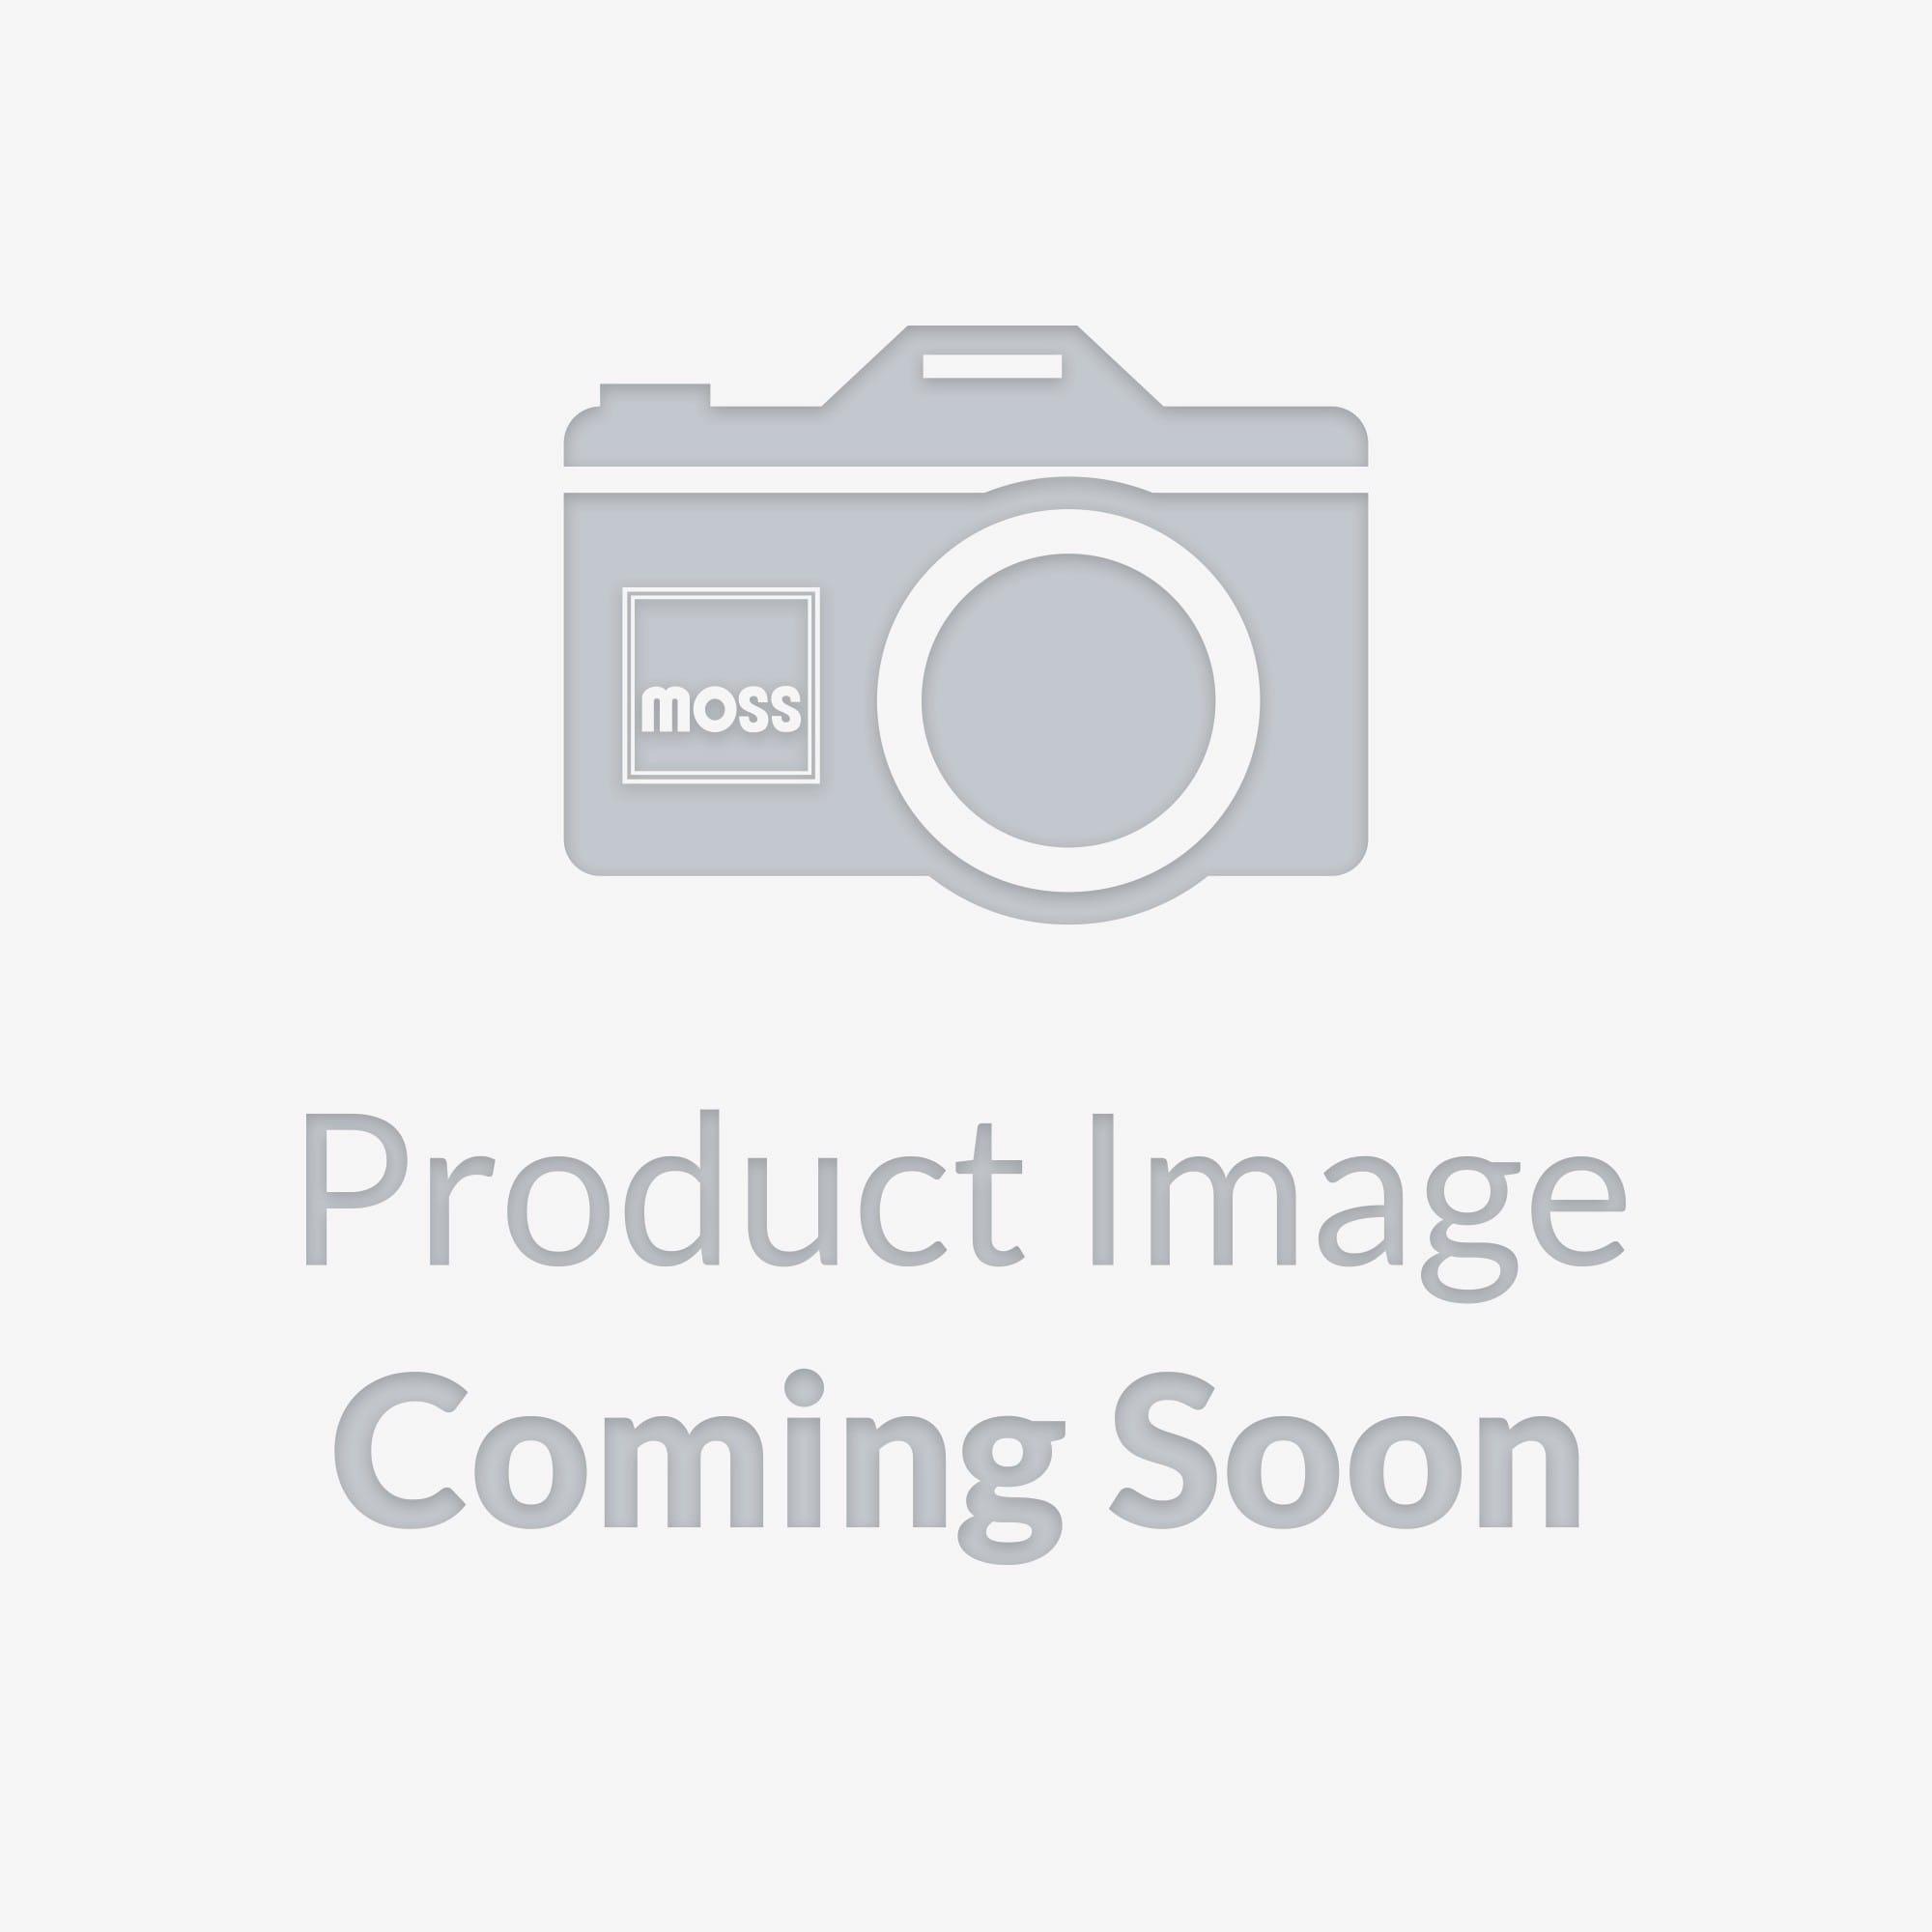 212-380 Book: Haynes Shop Manual, Midget/Sprite | Moss Motors